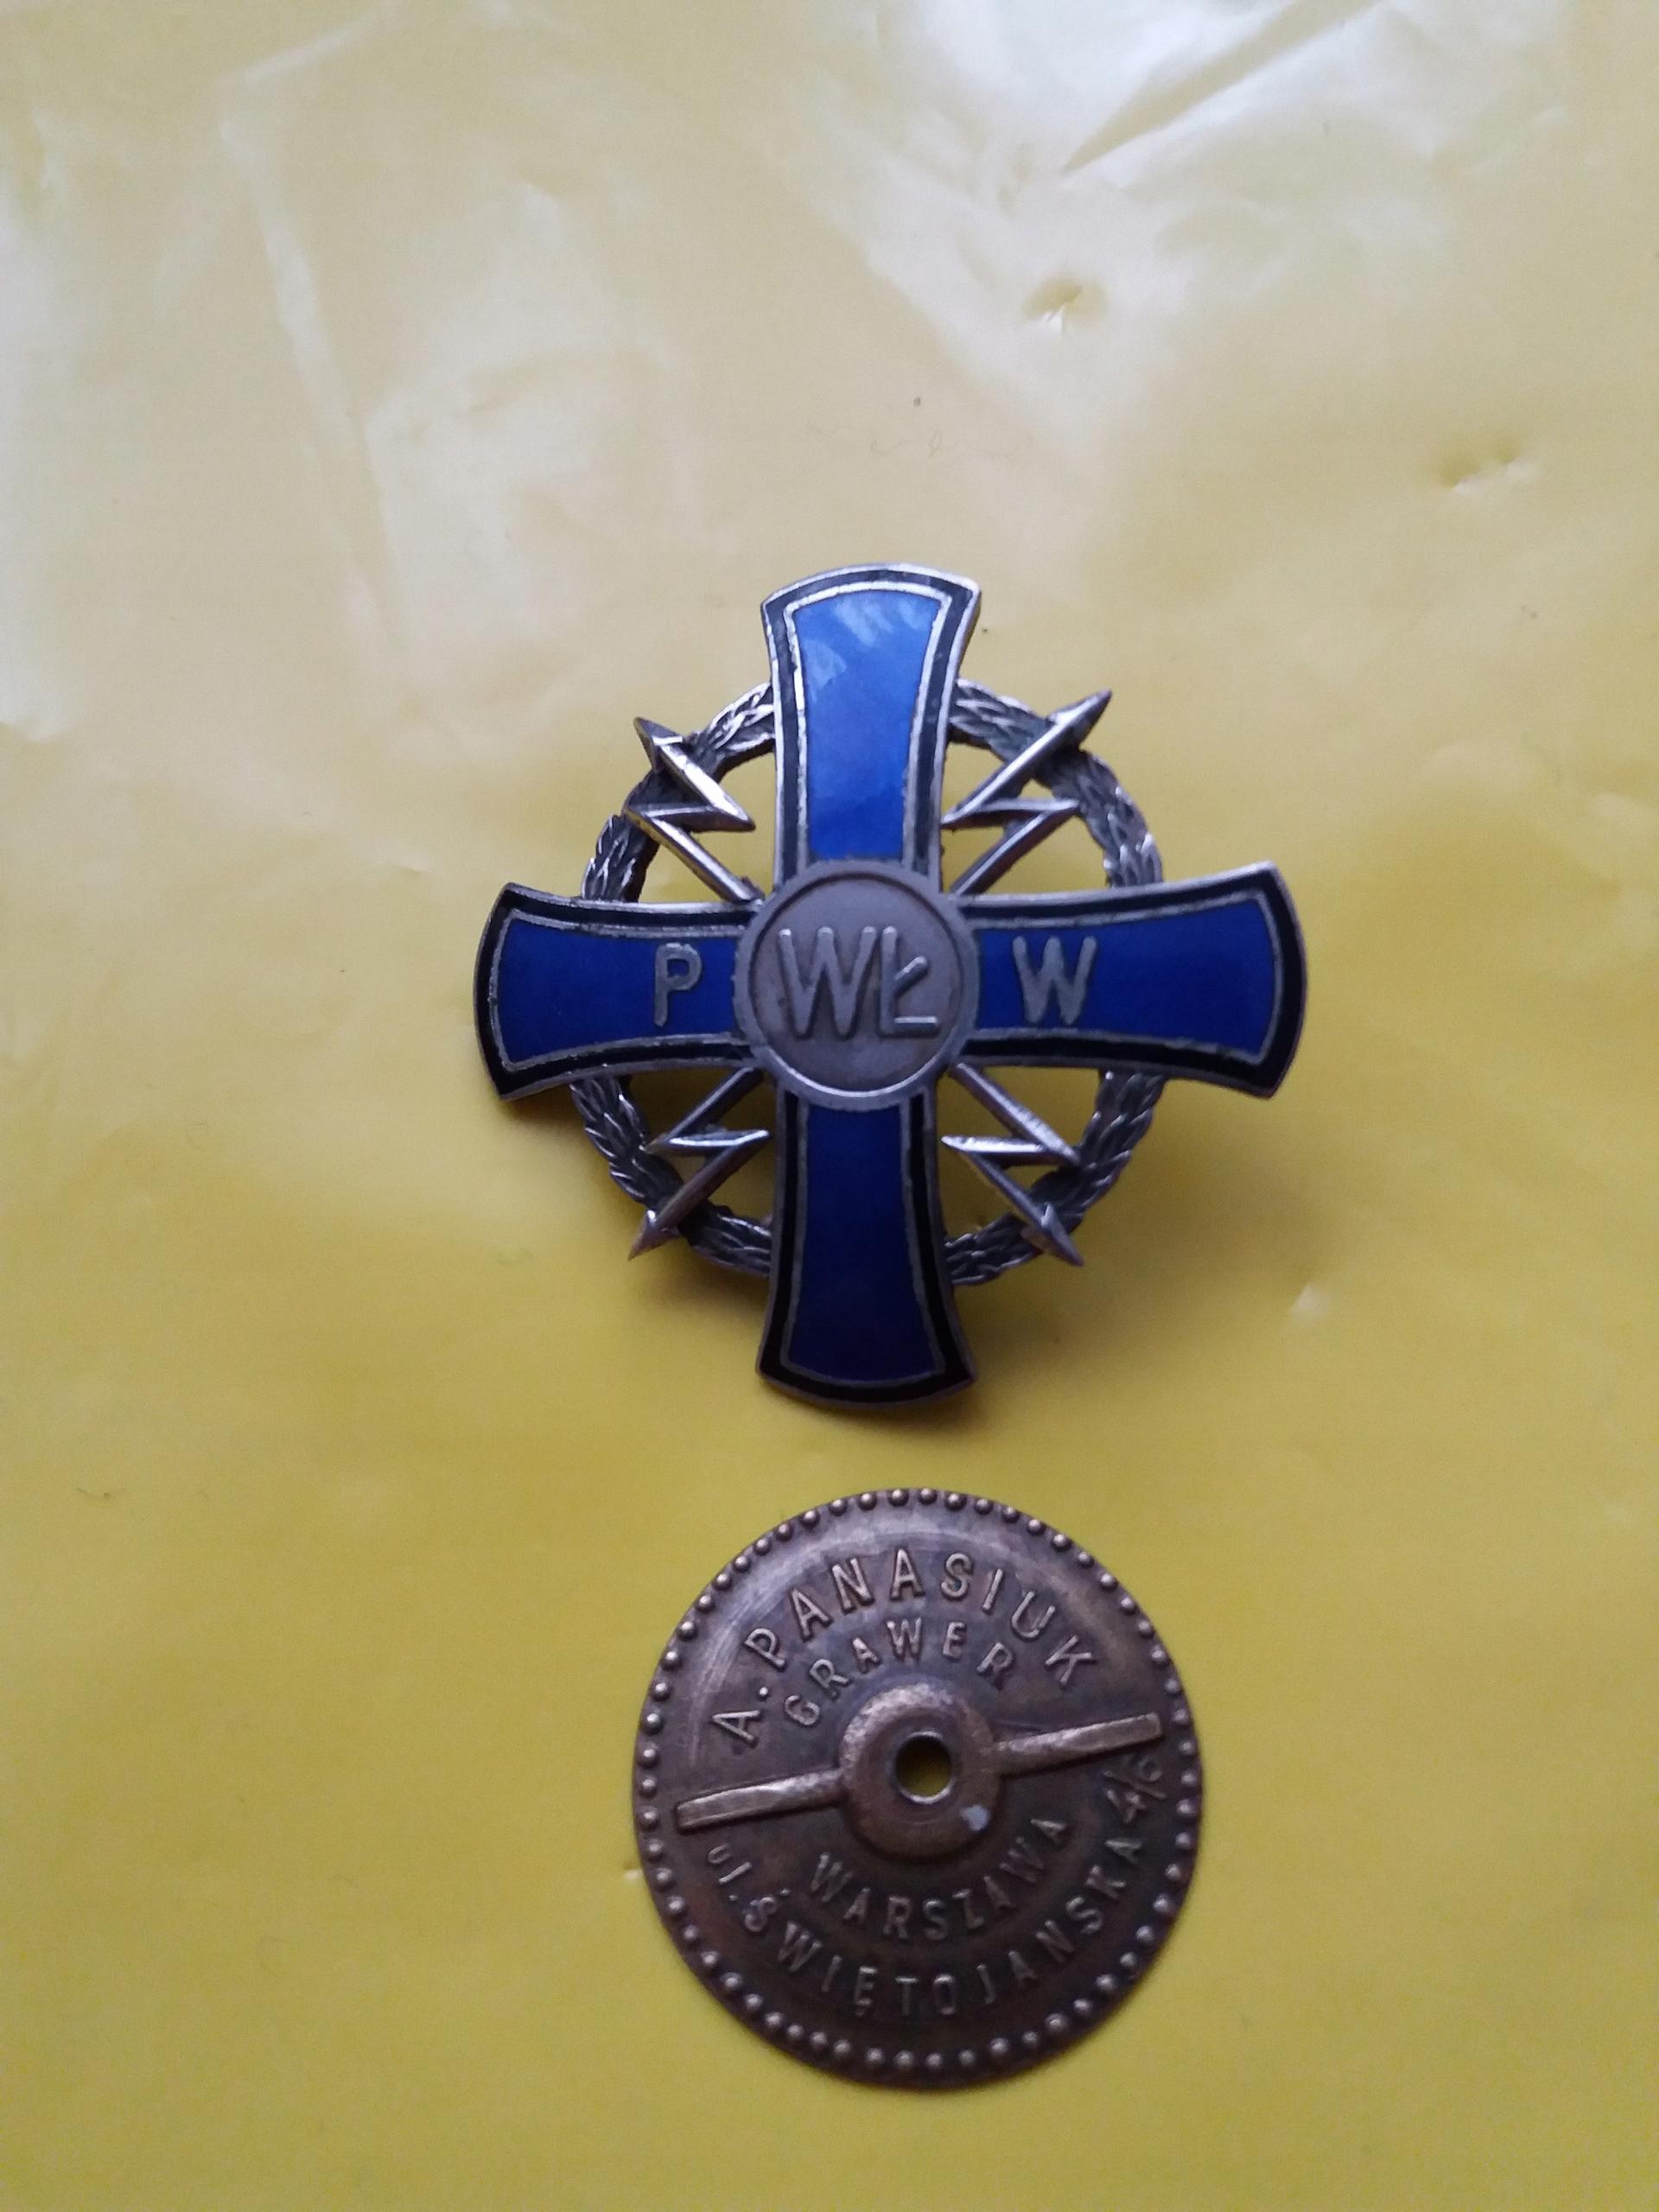 Odznaka pułkowa emaliowana